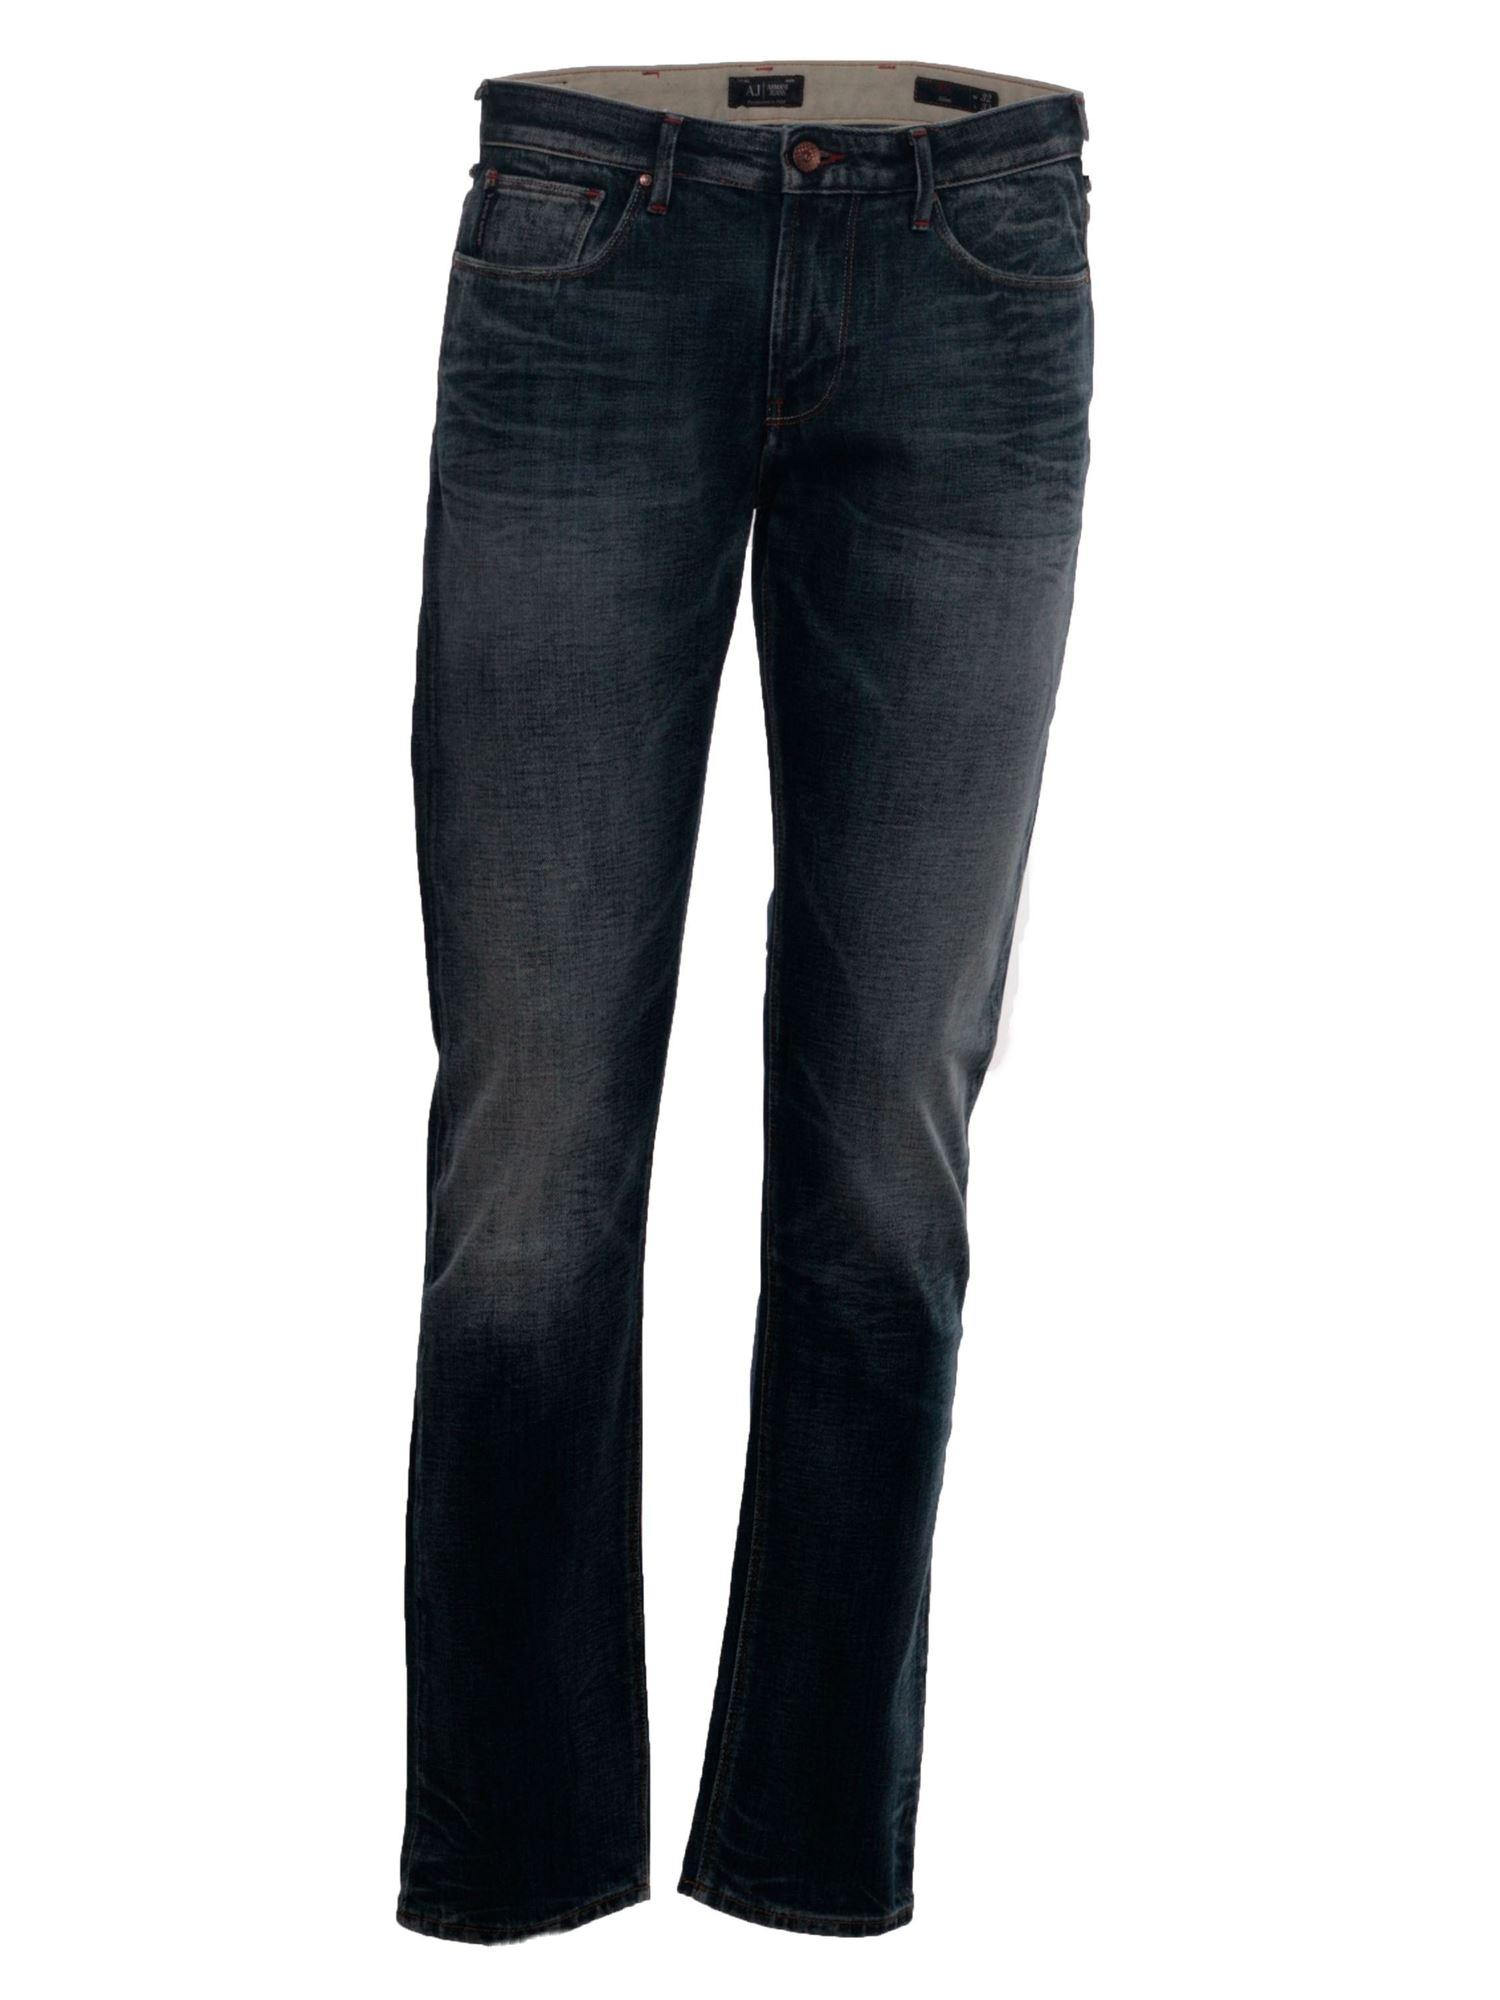 competitive price f9a1e f221d Armani Jeans Jeans Uomo Jeans | Lalilina